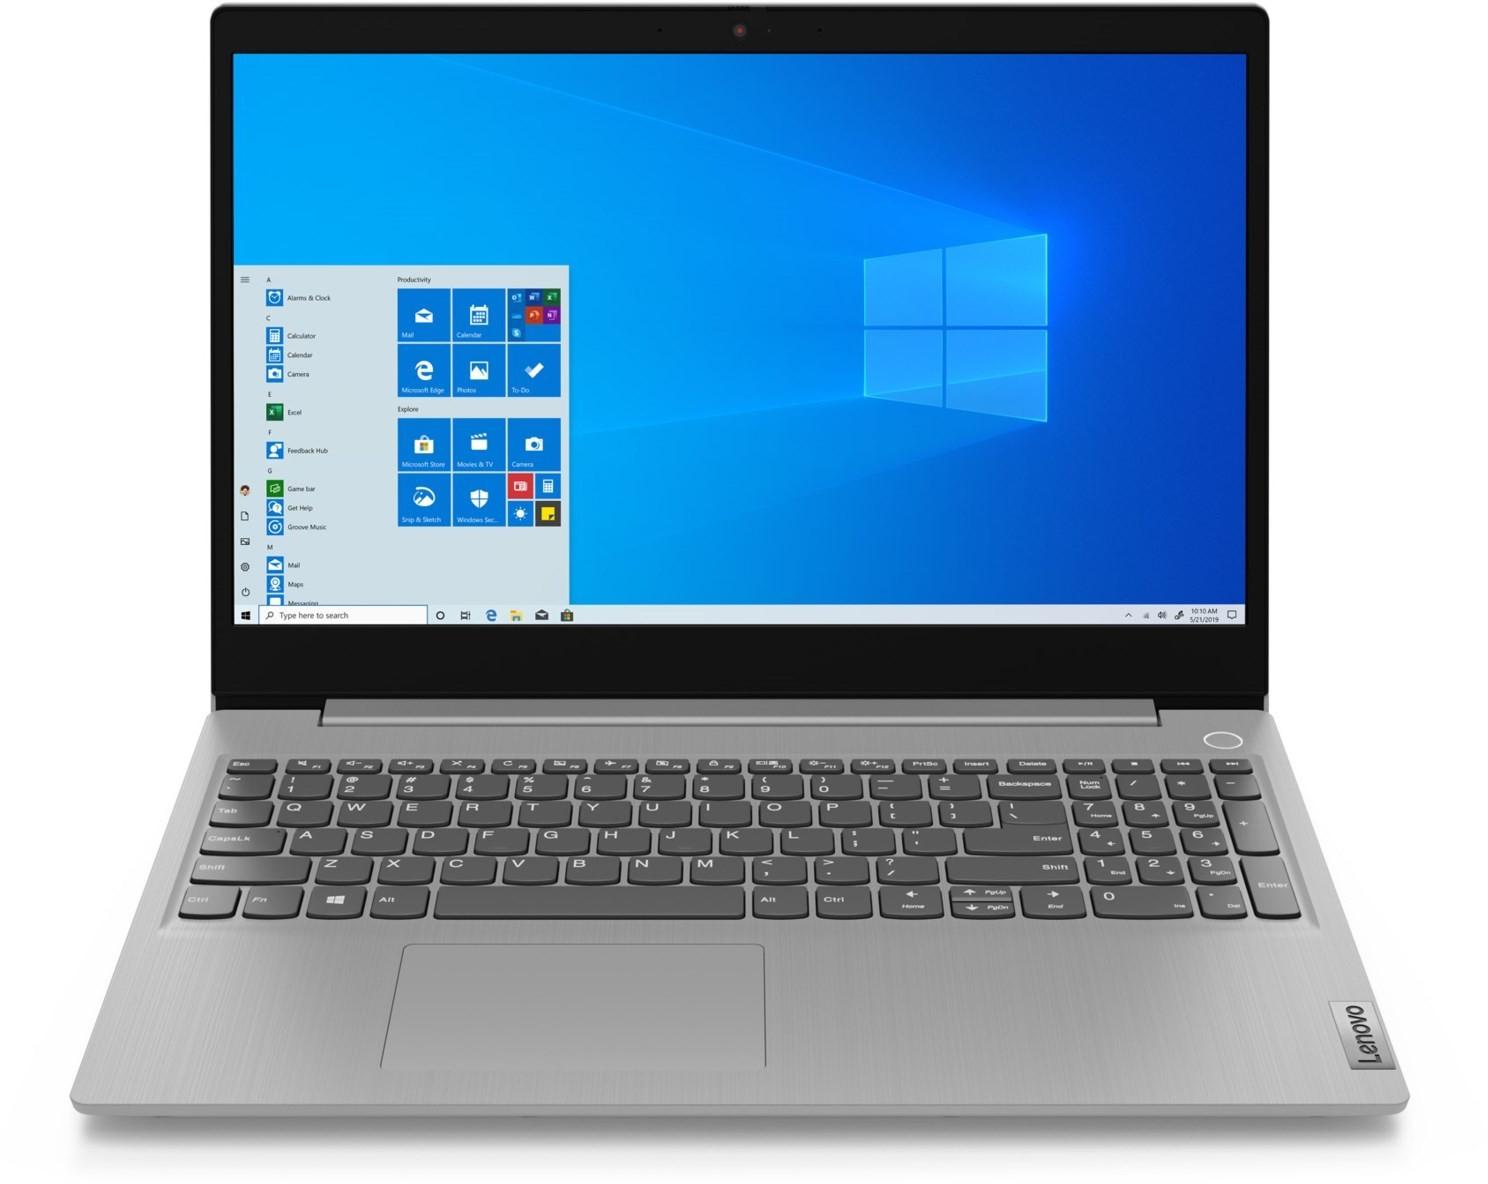 Bild zu 15,6 Zoll Notebook Lenovo IdeaPad 3 (Core i5 Prozessor, 8 GB RAM, 512 GB SSD, Intel UHD Grafik) für 466,93€ (Vergleich: 543€)